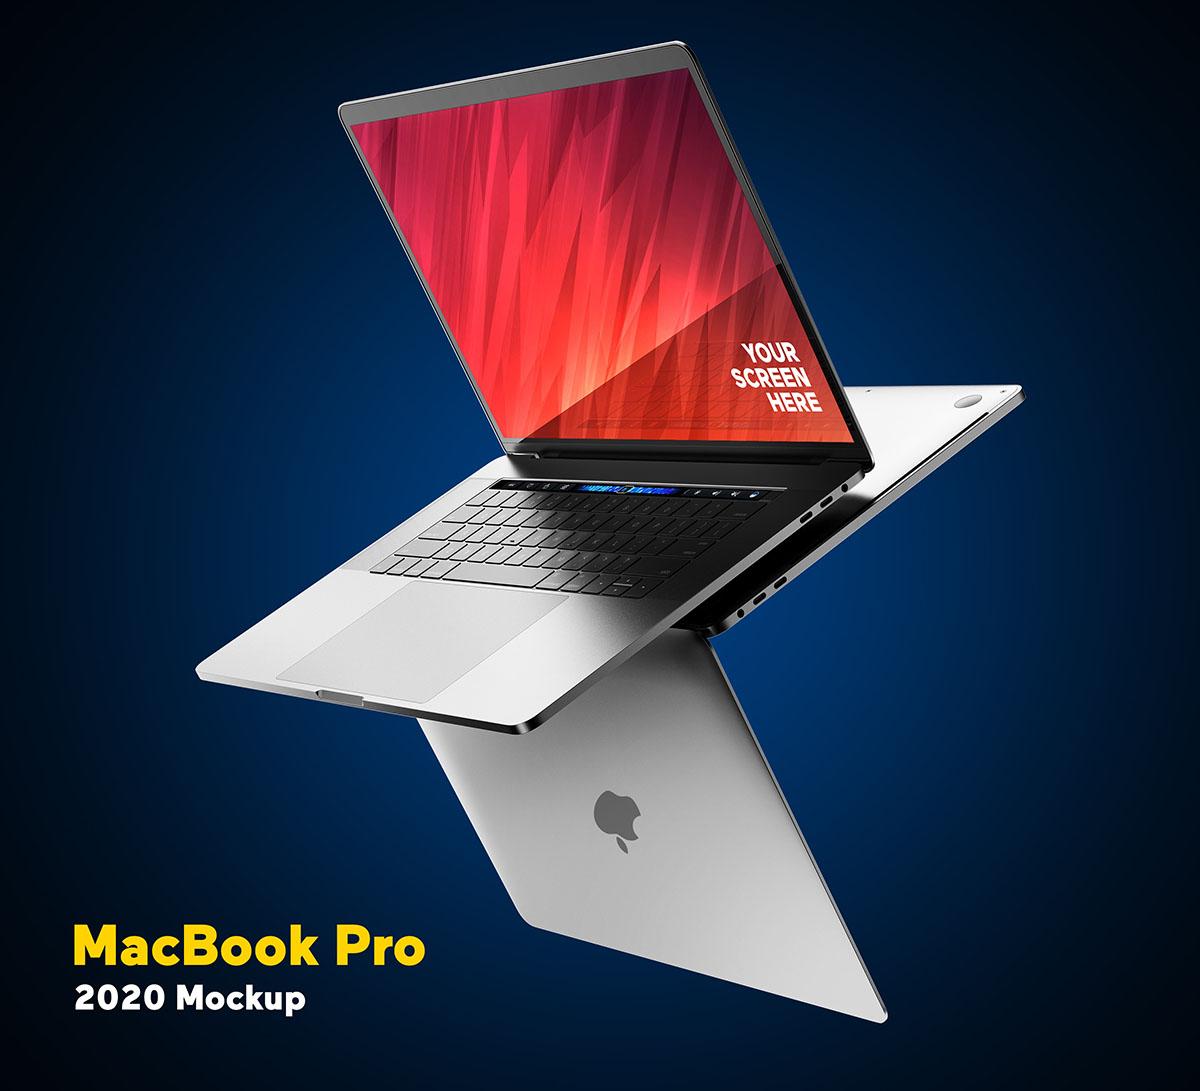 MacBook Pro 2020 Psd Mockup